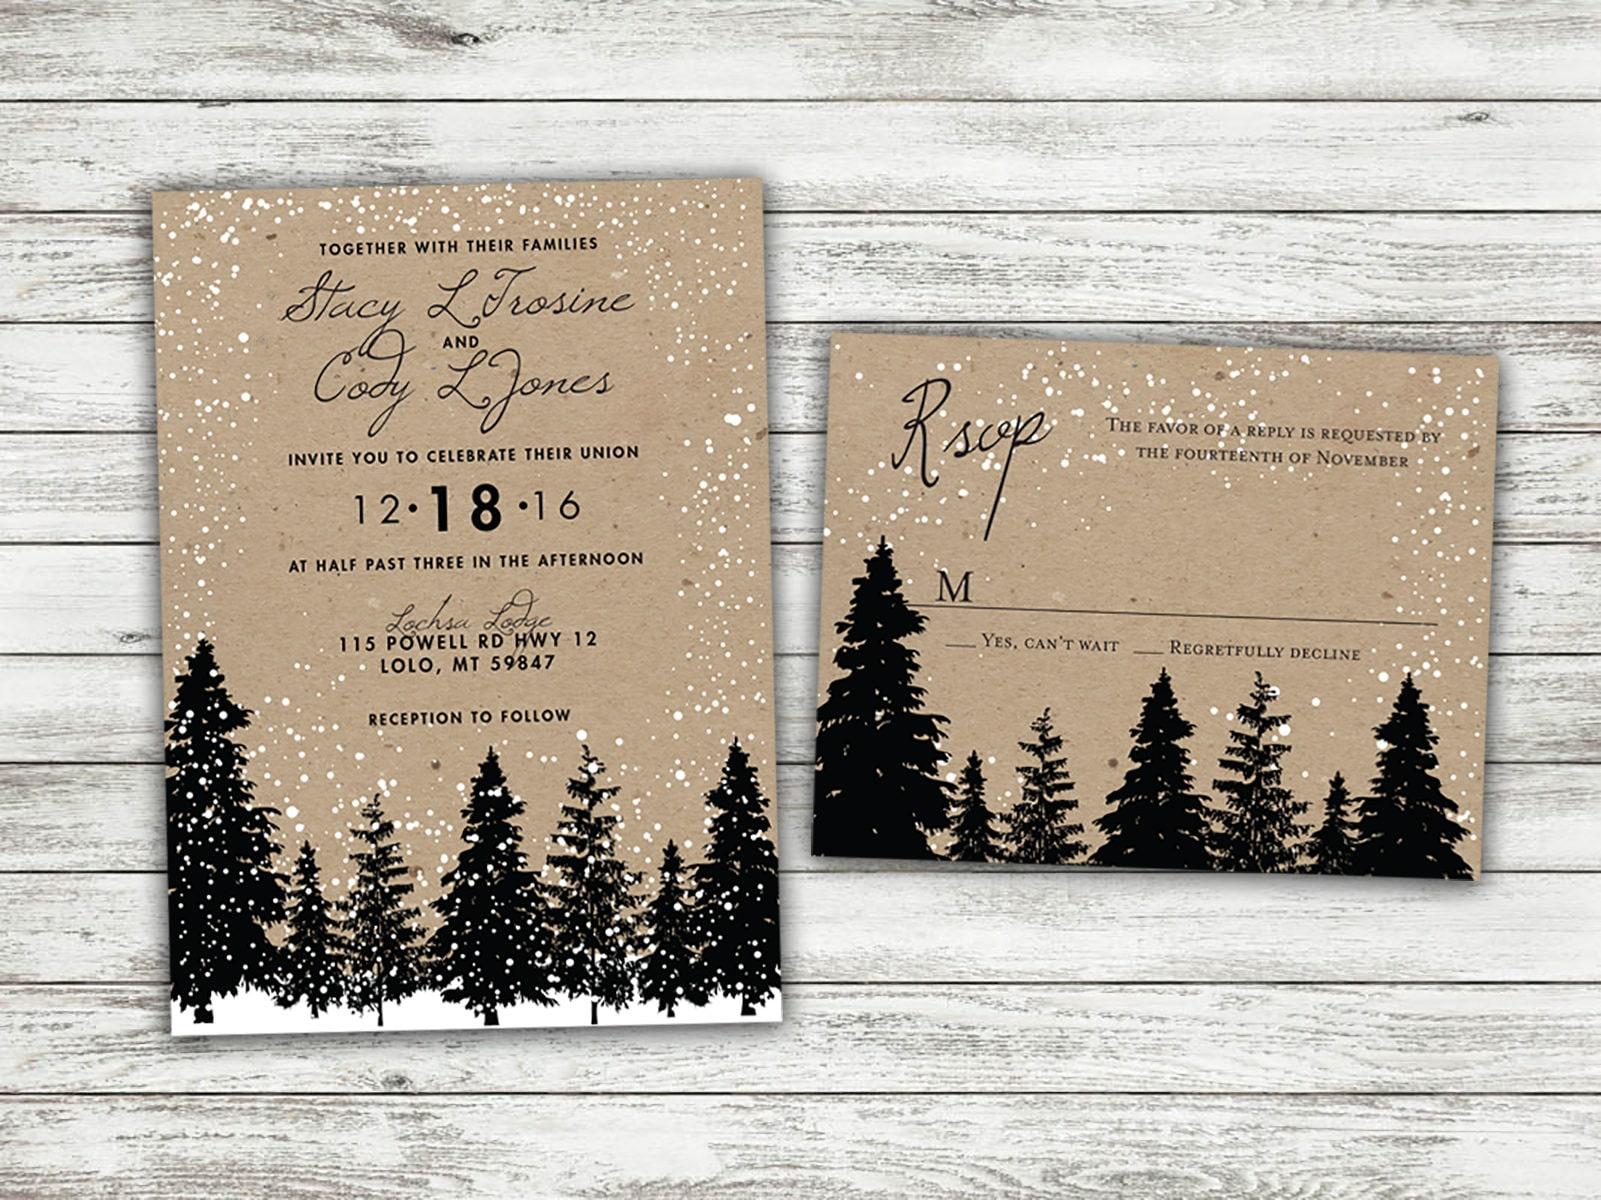 Winter Wedding Invitation Wording: Rustic Winter Wedding Invitations Snow Wedding Invitation